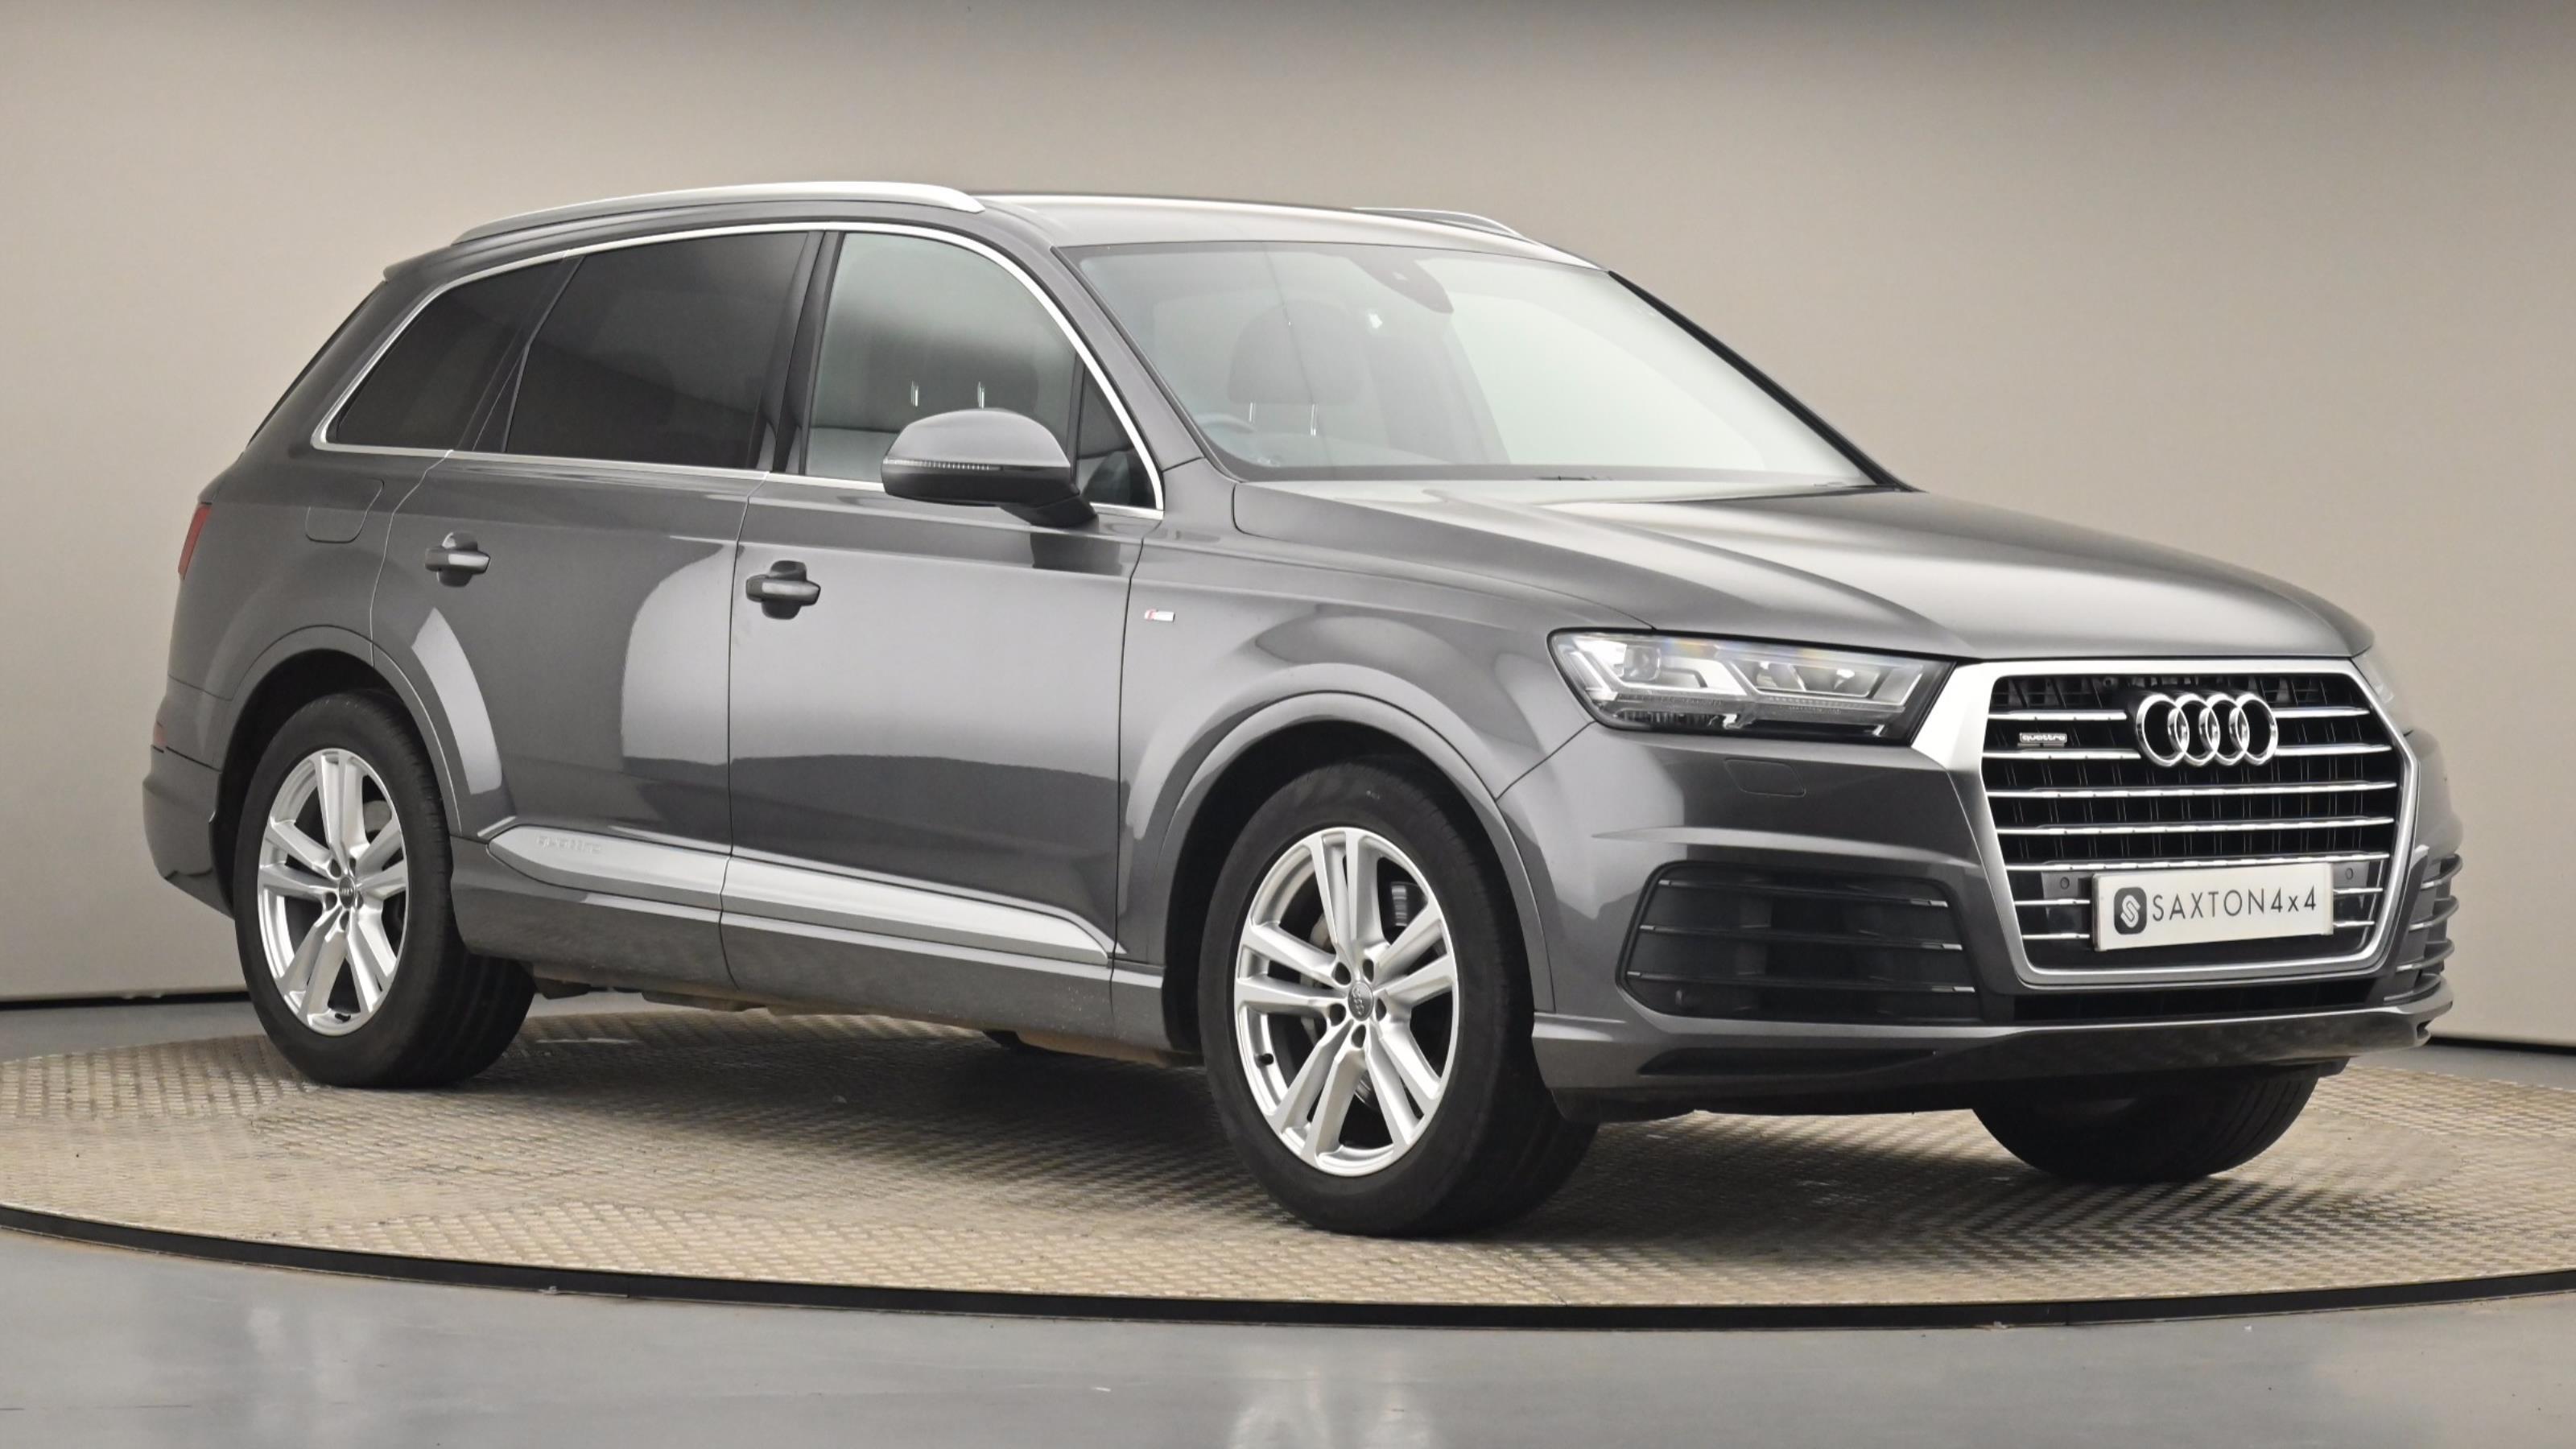 Used 2019 Audi Q7 45 TDI Quattro S Line 5dr Tiptronic [C+S Pack] GREY at Saxton4x4